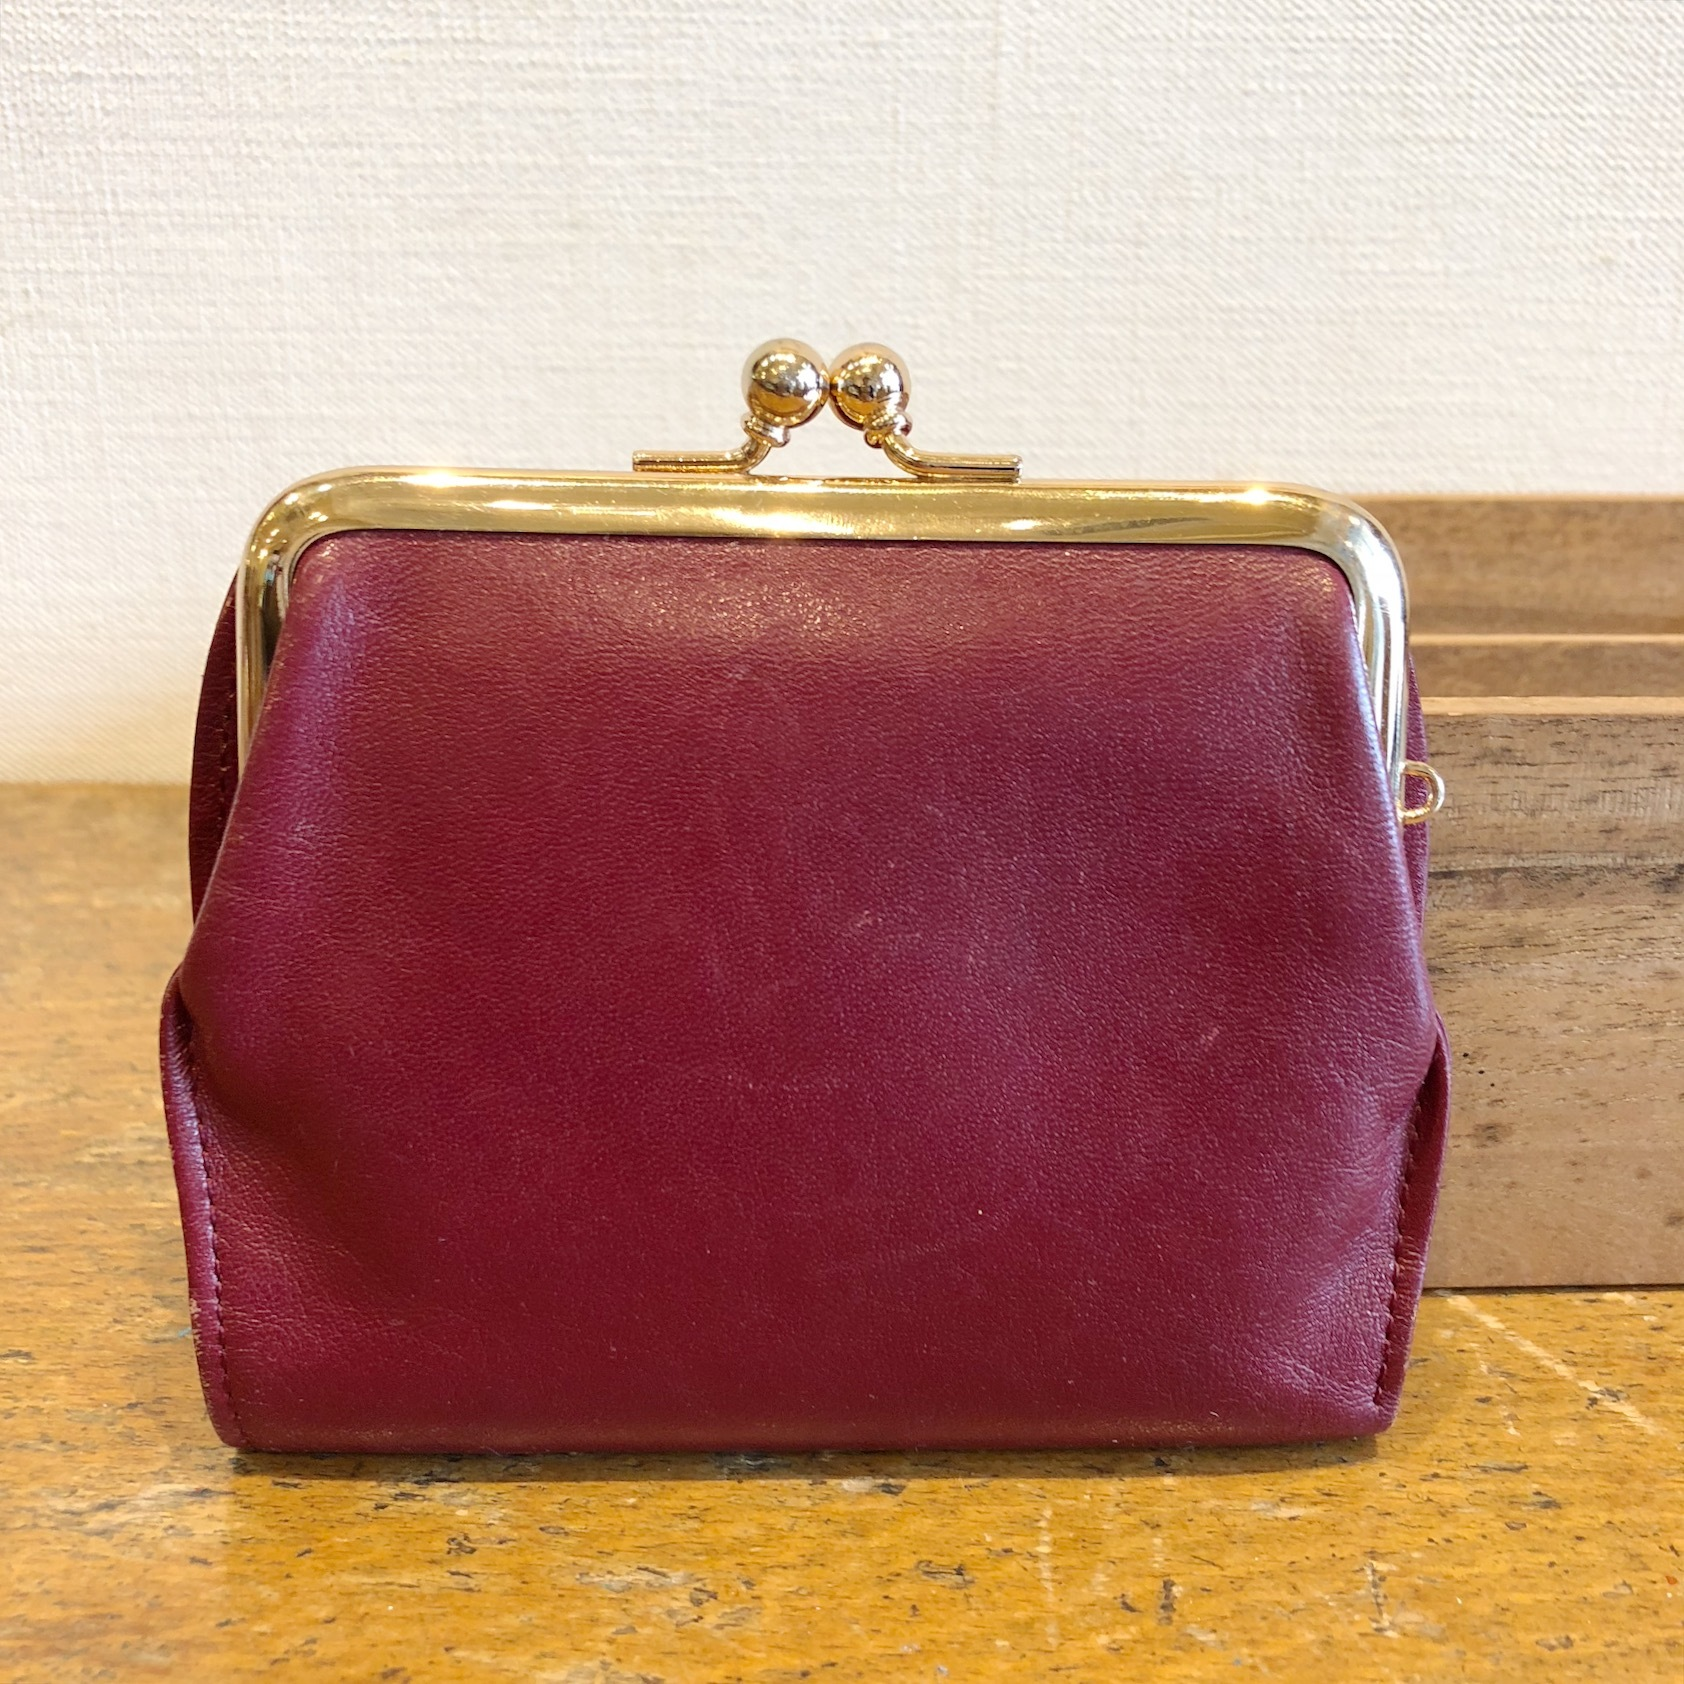 Pierre balmain Vintage wallet